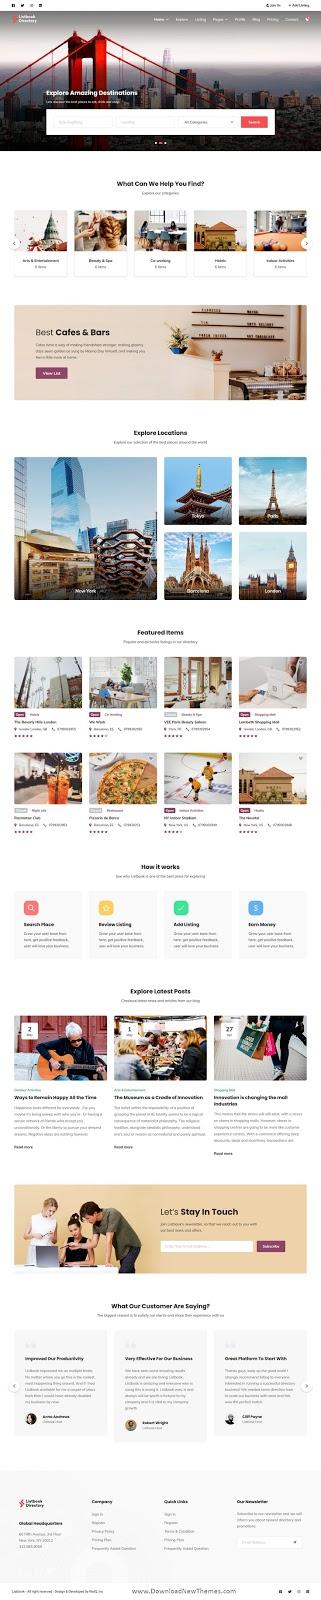 Directory Listing WordPress Theme